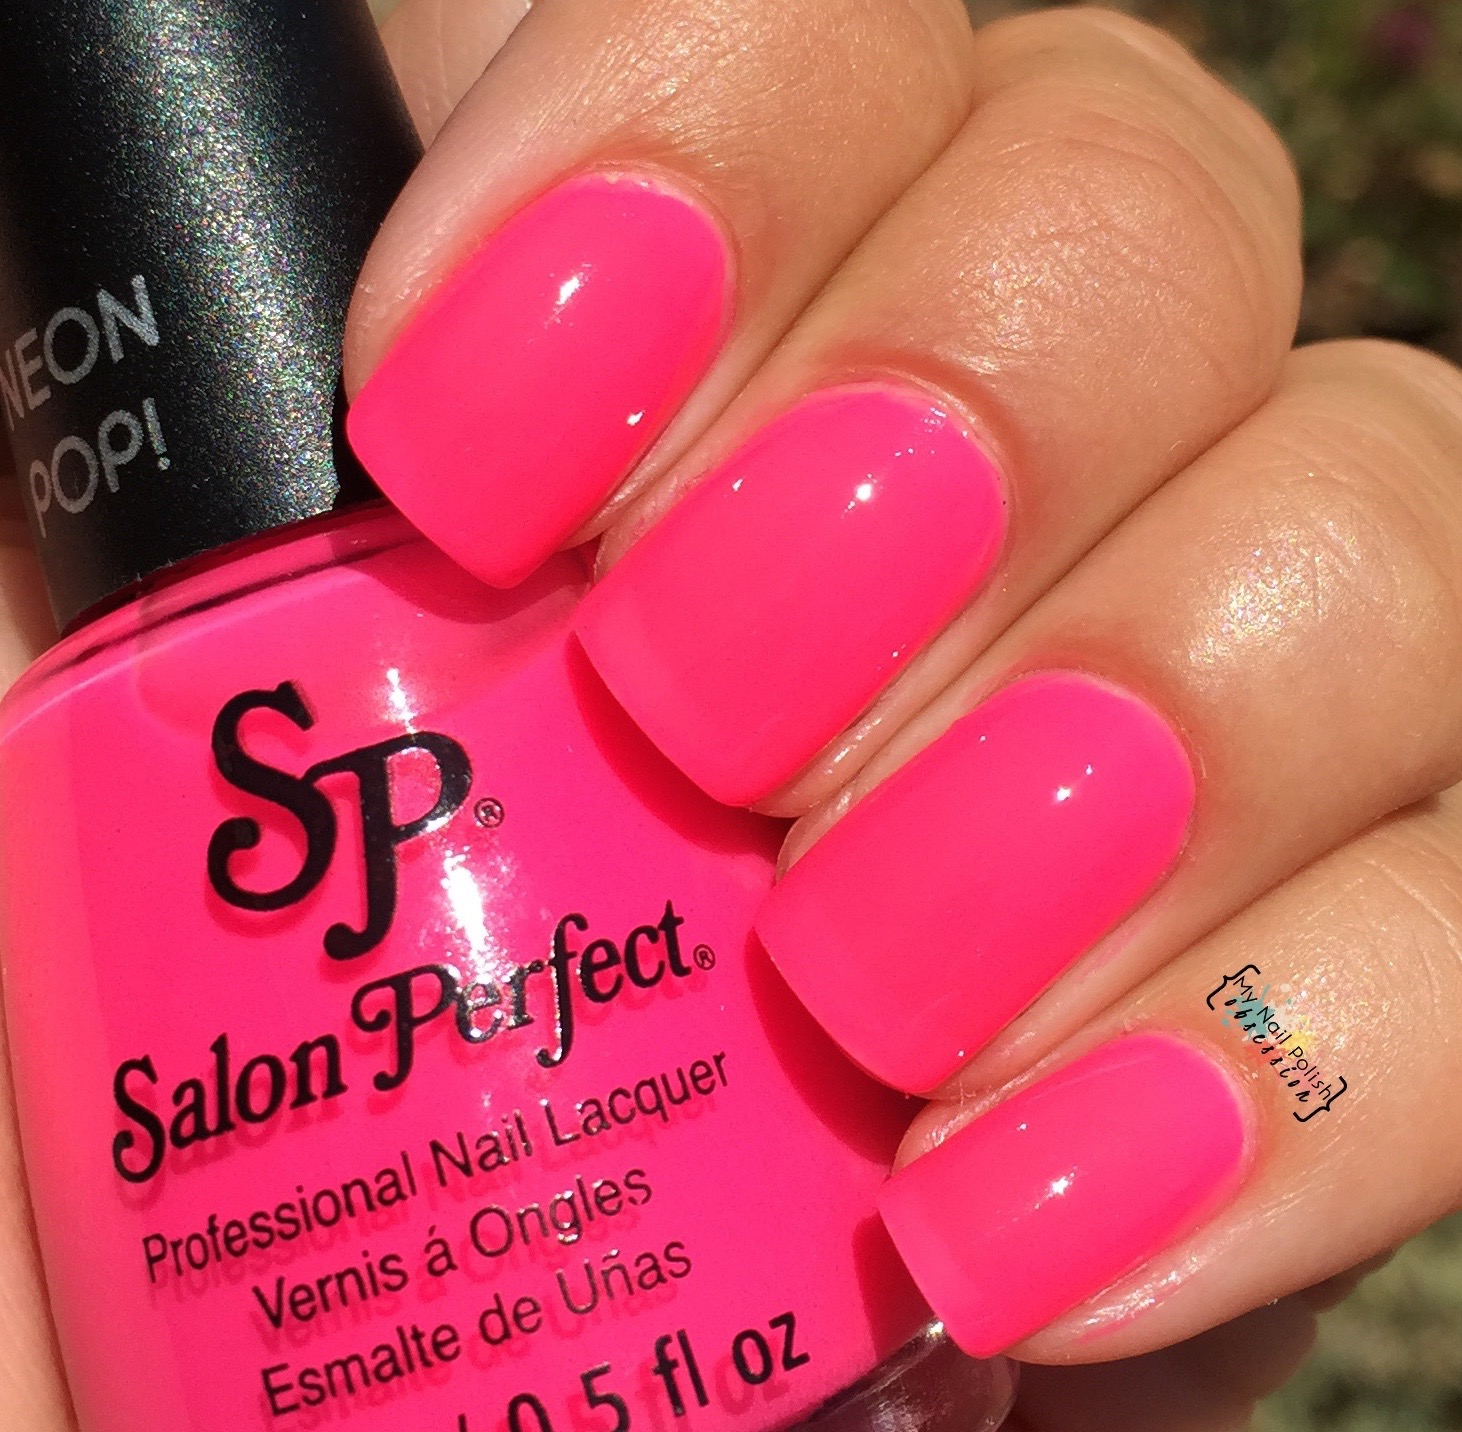 My Nail Polish Obsession: Salon Perfect Neon Pop! (partial